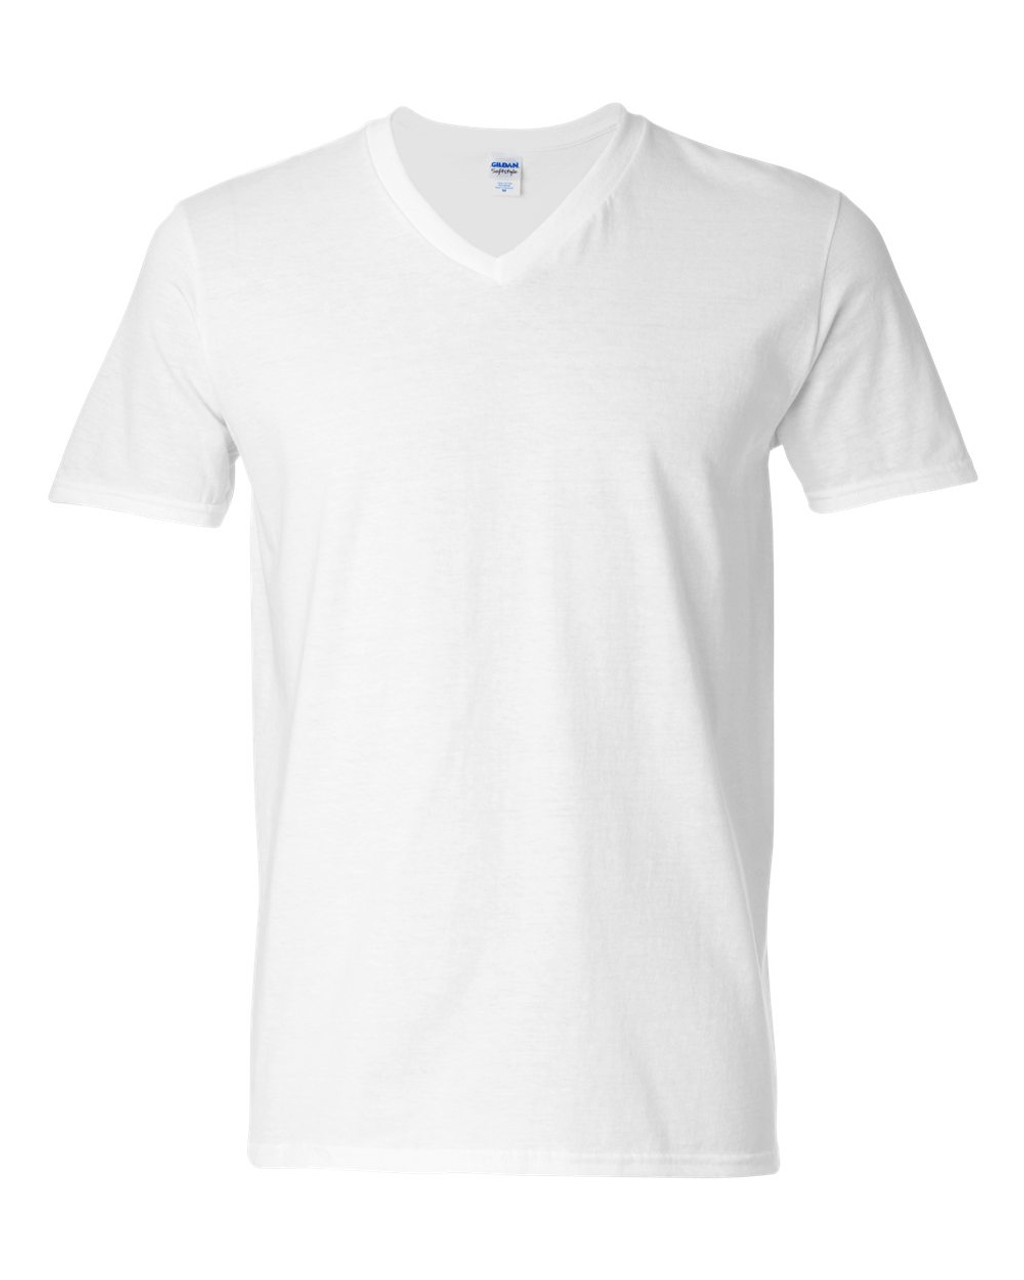 64V00 Gildan Adult V-neck T-shirt | T-shirt.ca